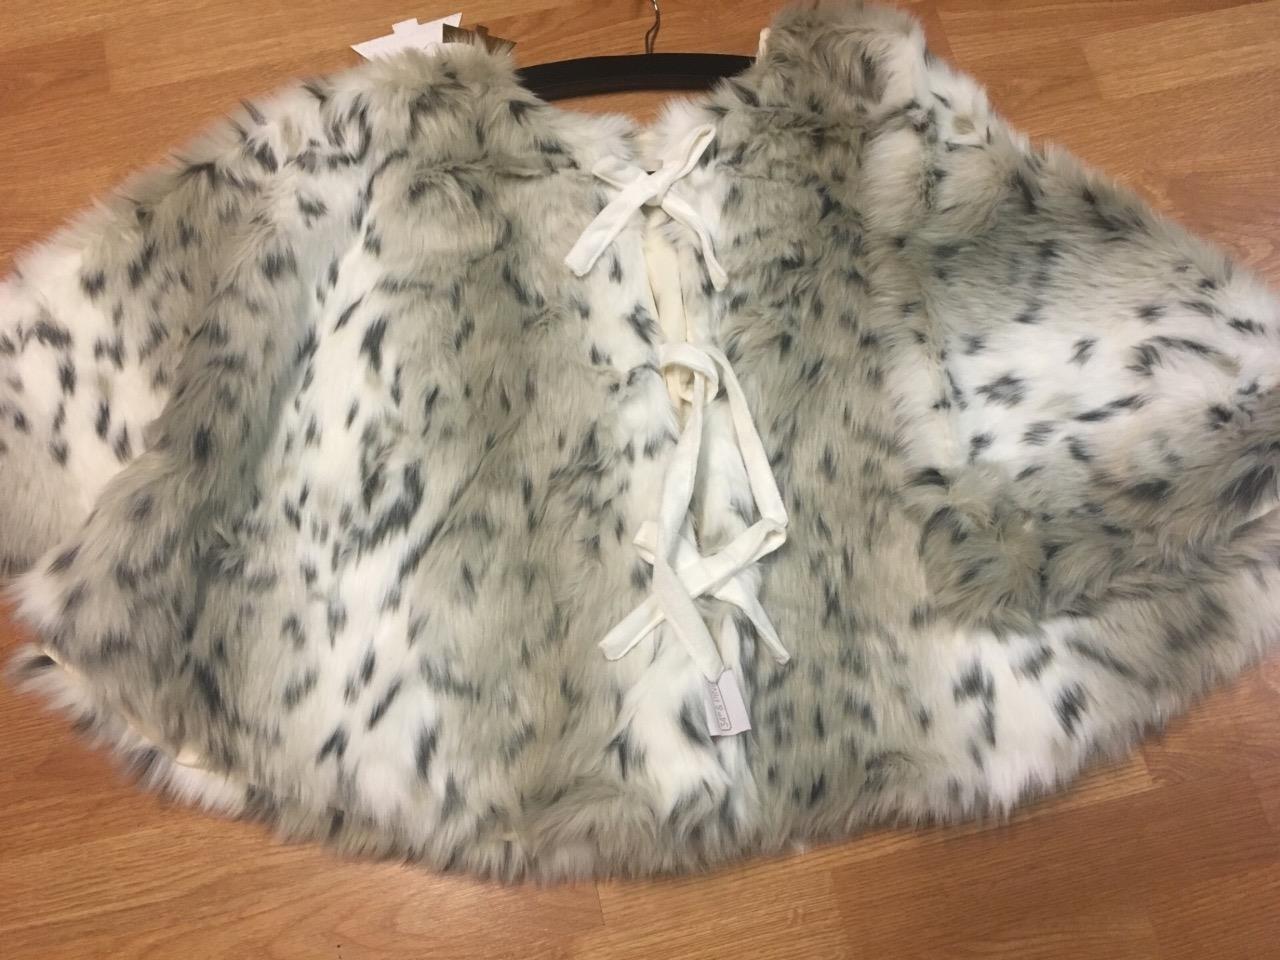 34th & Pine Luxury Polar Plush Faux Fur 52'' Christmas Tree Skirt - Snow Leopard